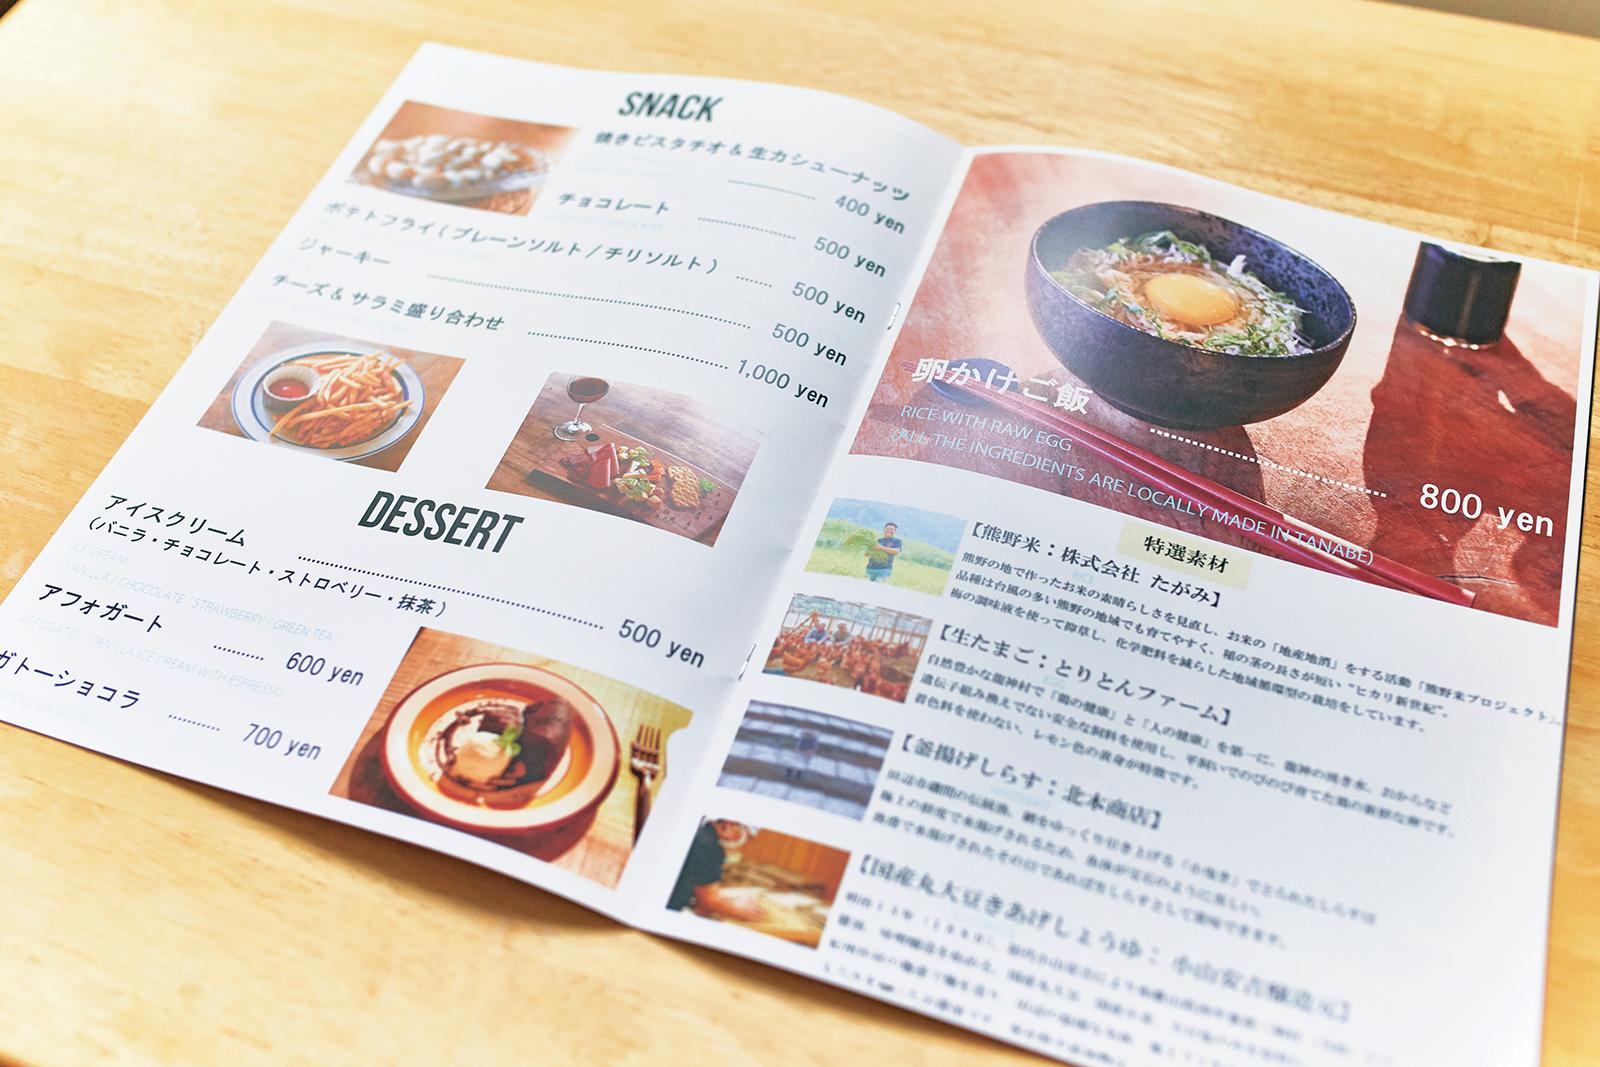 『the CUE』では田辺の食材を使った料理を提供。10月からの新メニューは、和歌山県立神島高校・写真部の生徒たちが撮影した写真を使用。